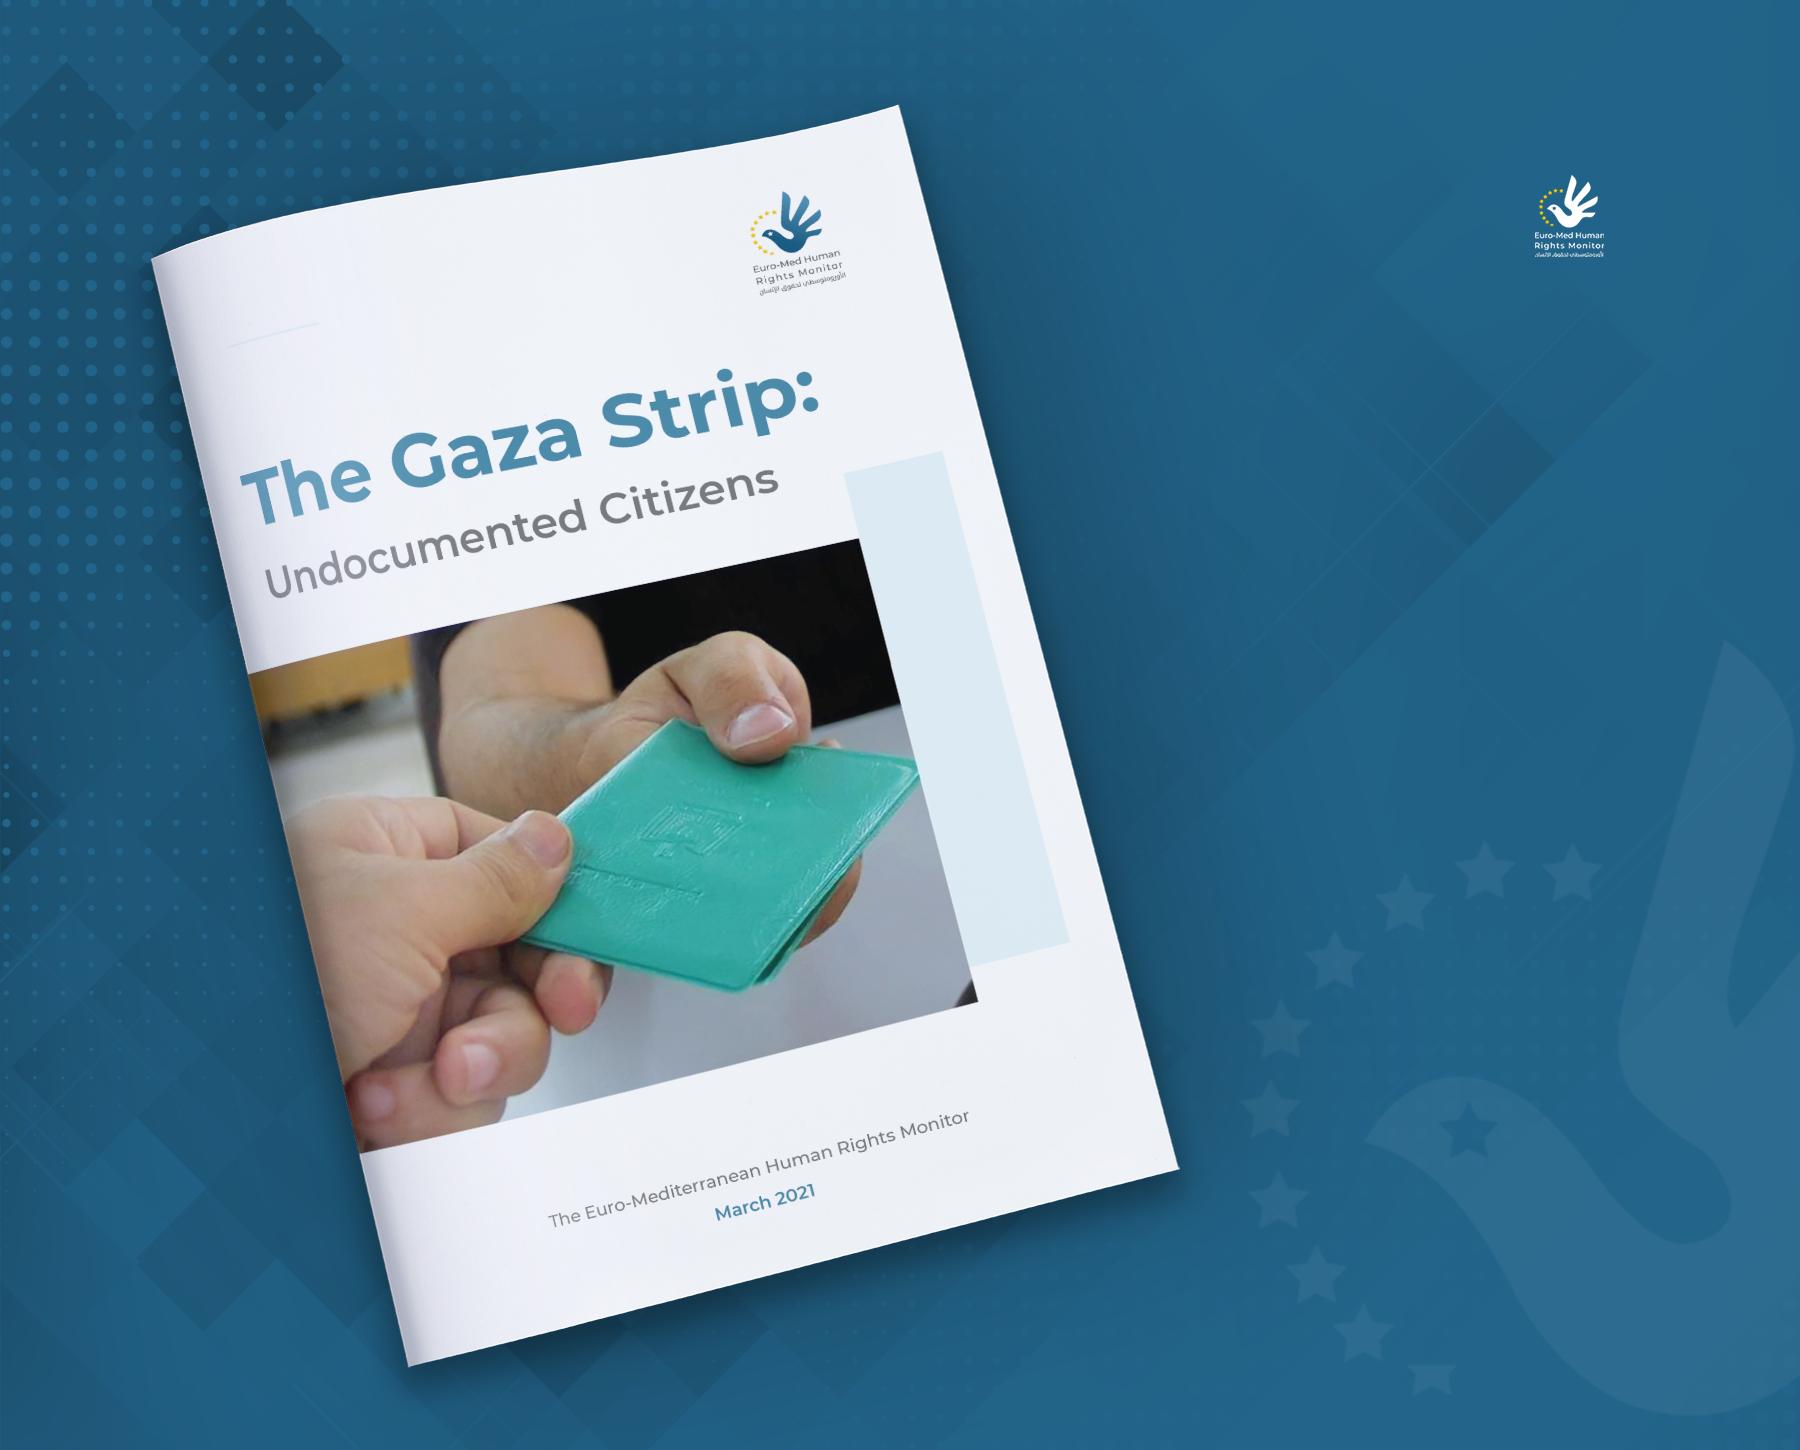 The Gaza Strip: Undocumented Citizens